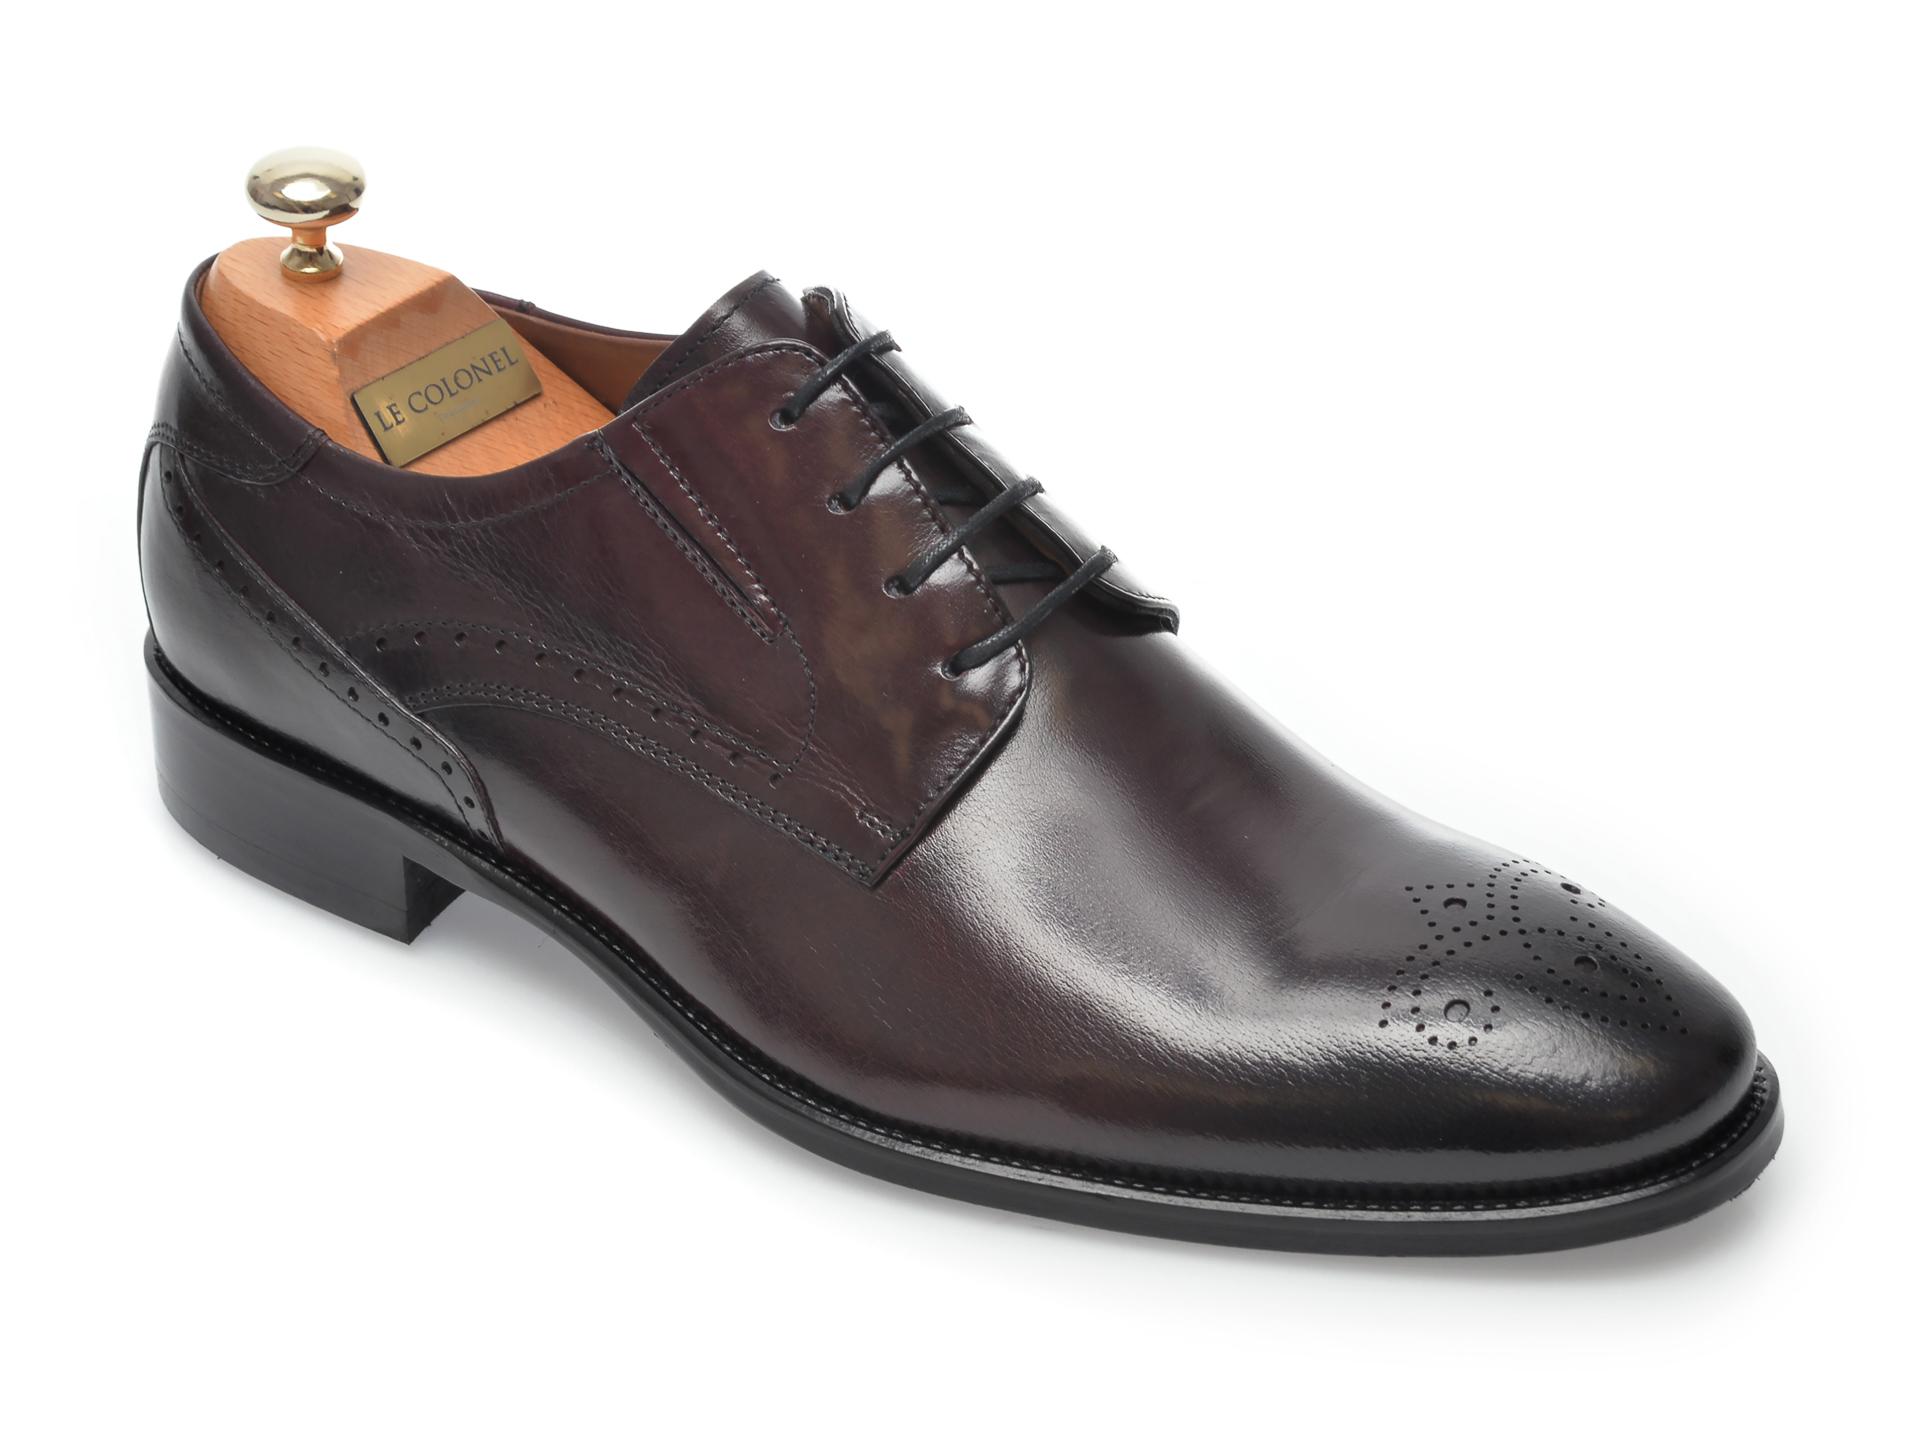 Pantofi LE COLONEL visinii, 33850, din piele naturala imagine otter.ro 2021